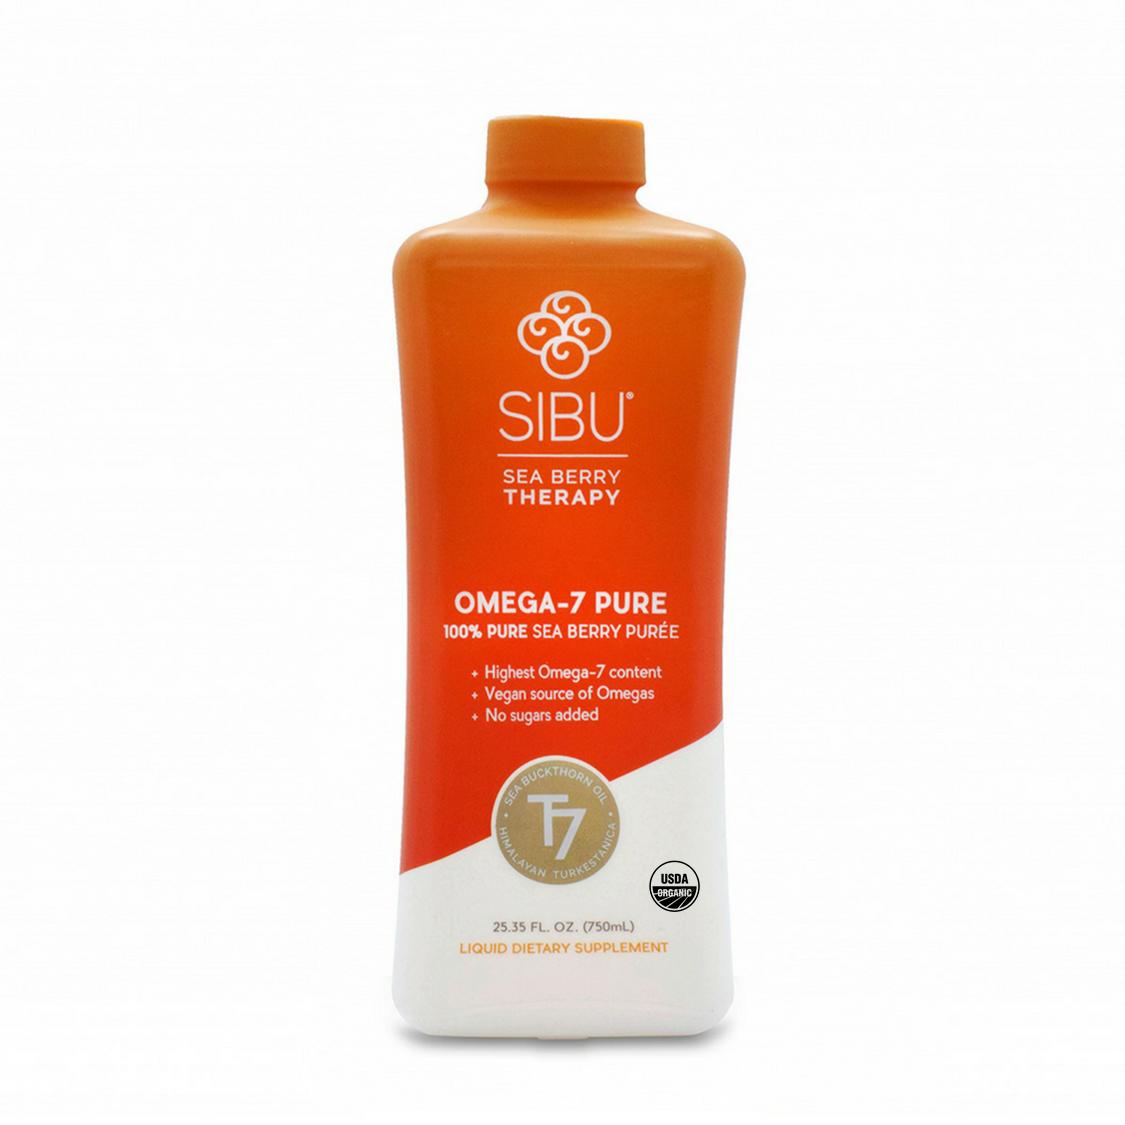 Omega 7 Pure - Sea Buckthorn Supplement